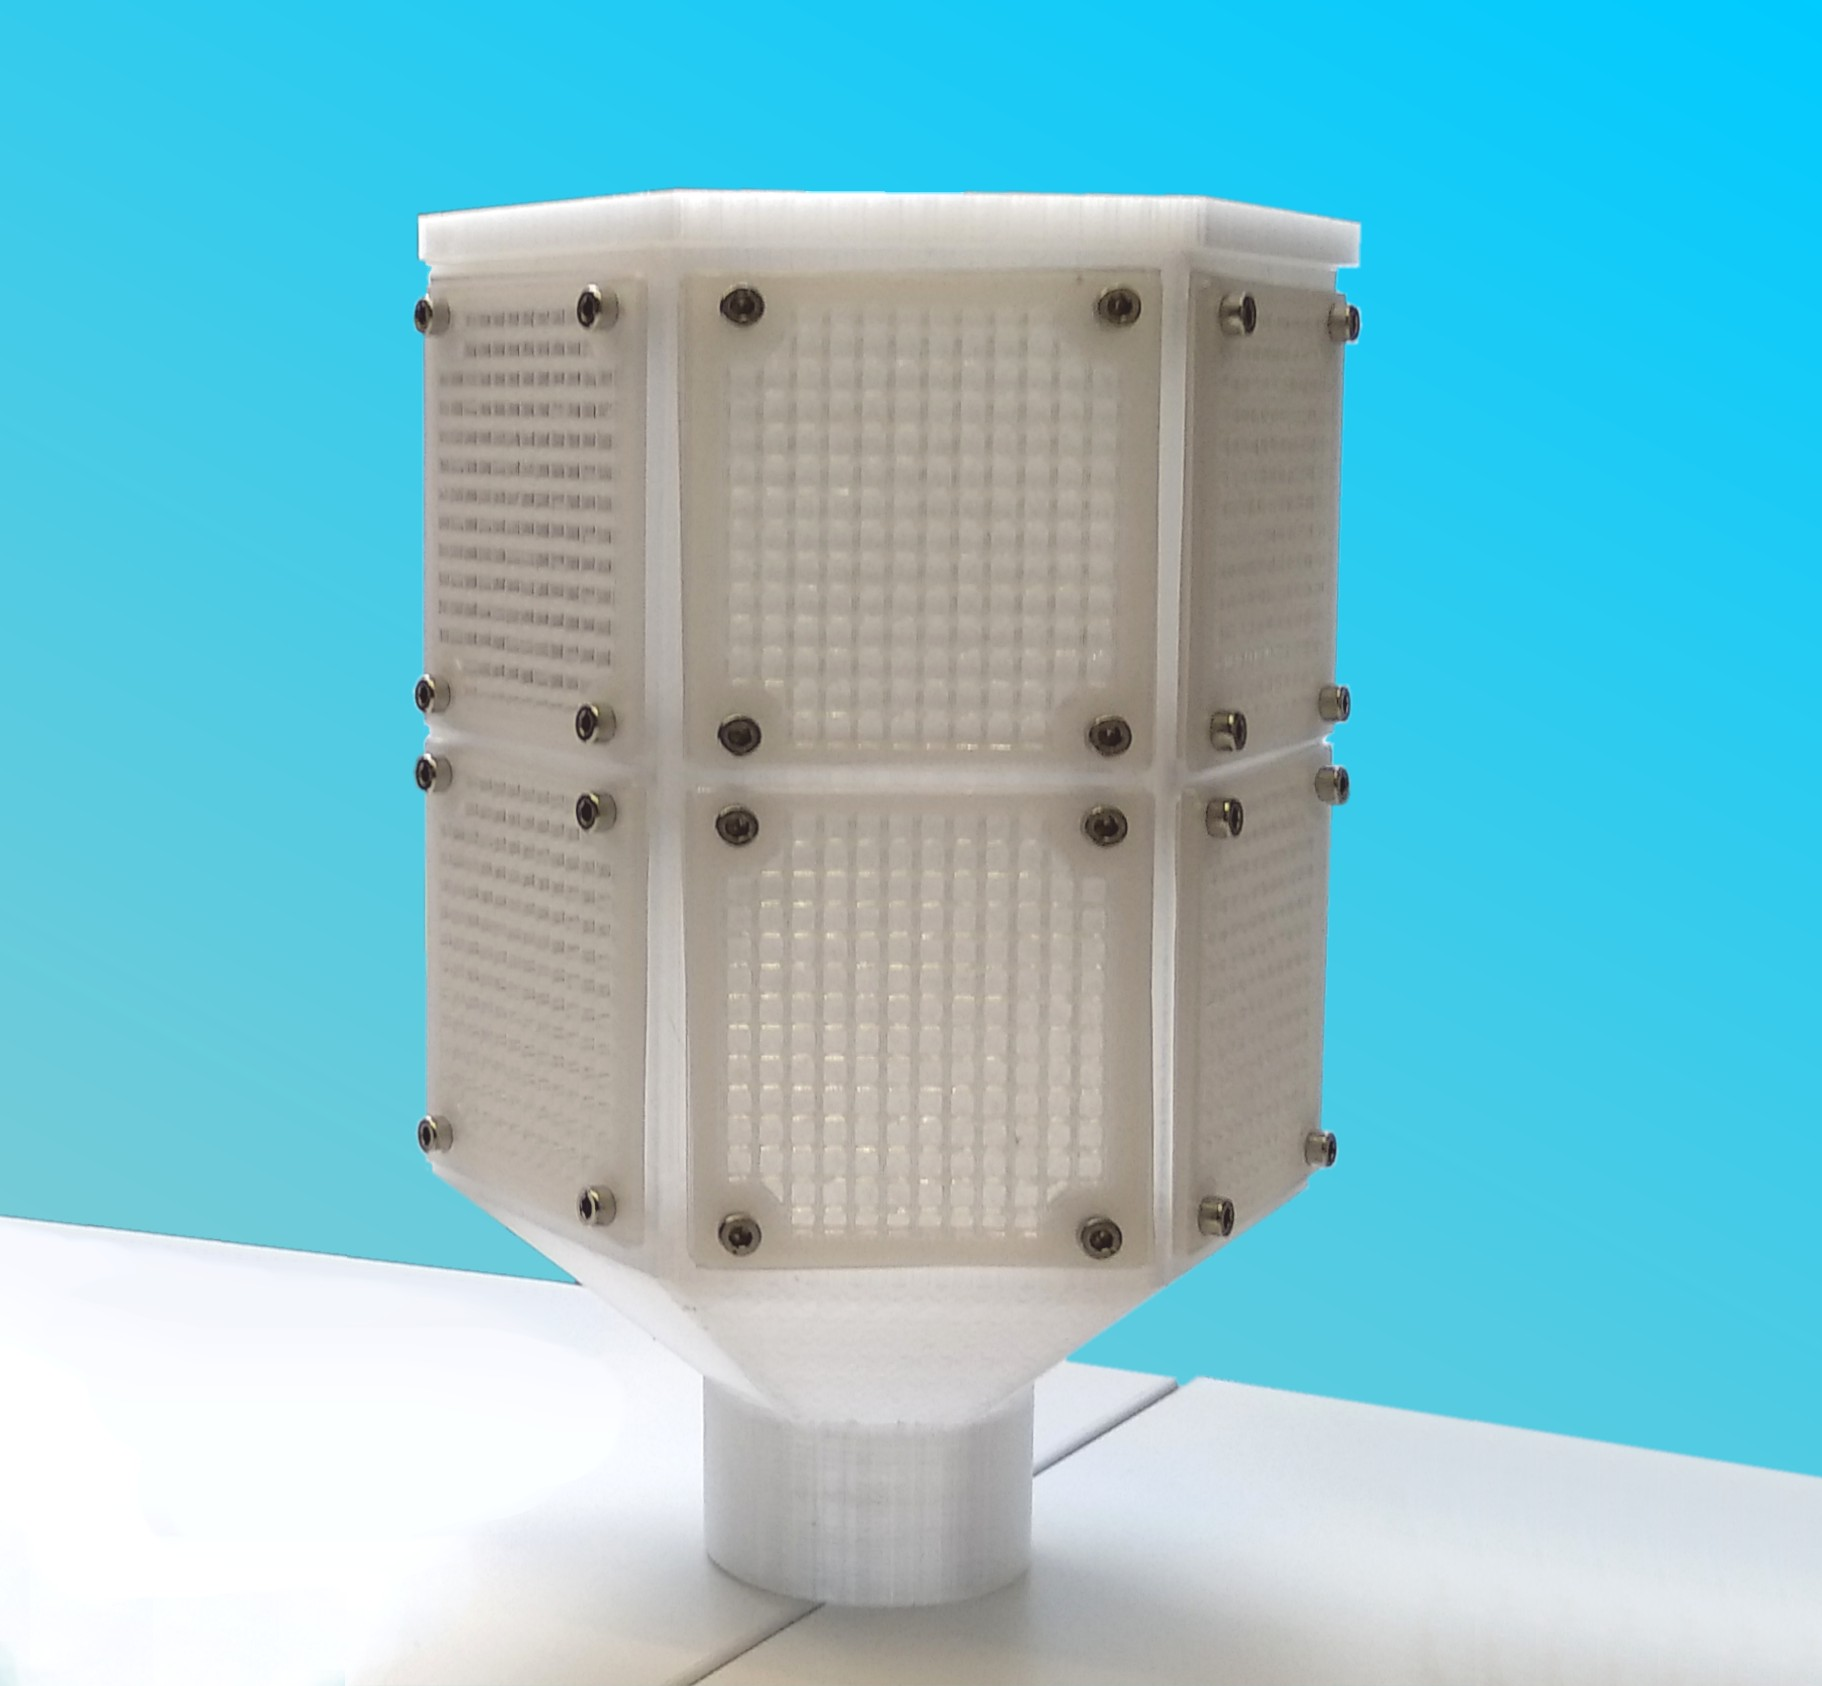 CAPTACO2 3D printed module